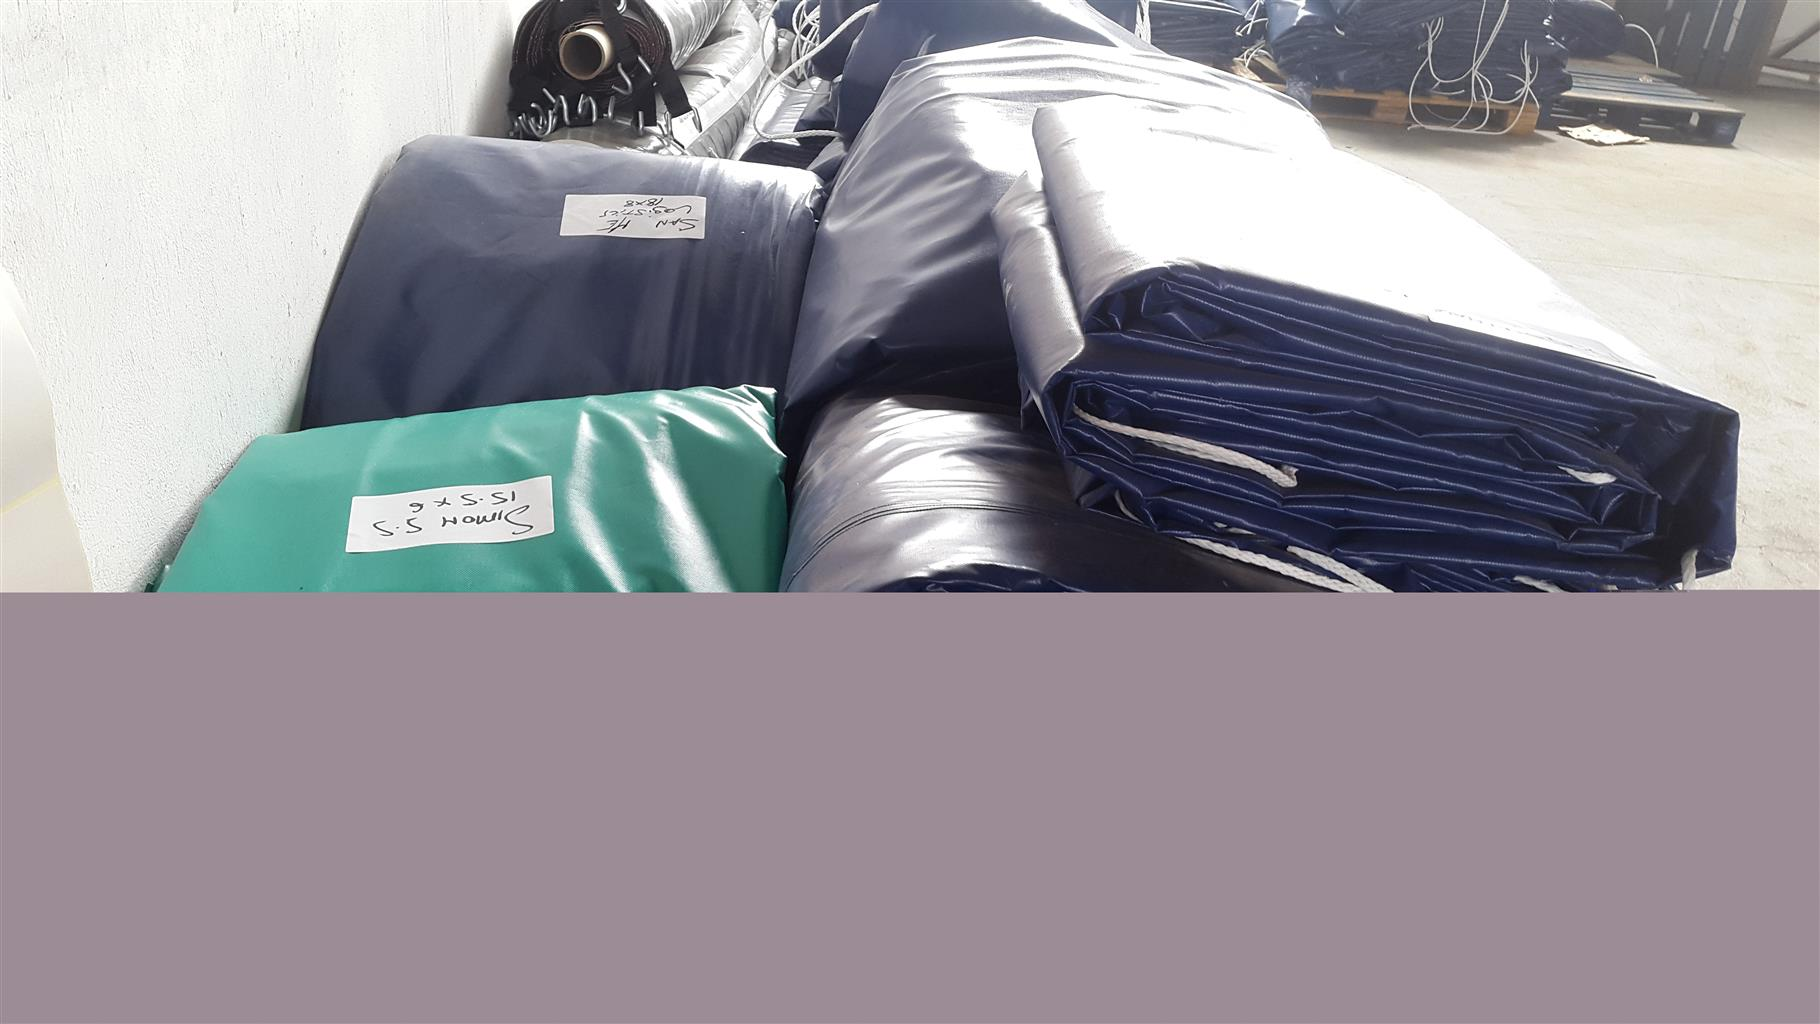 TIPPER PVC COVERS